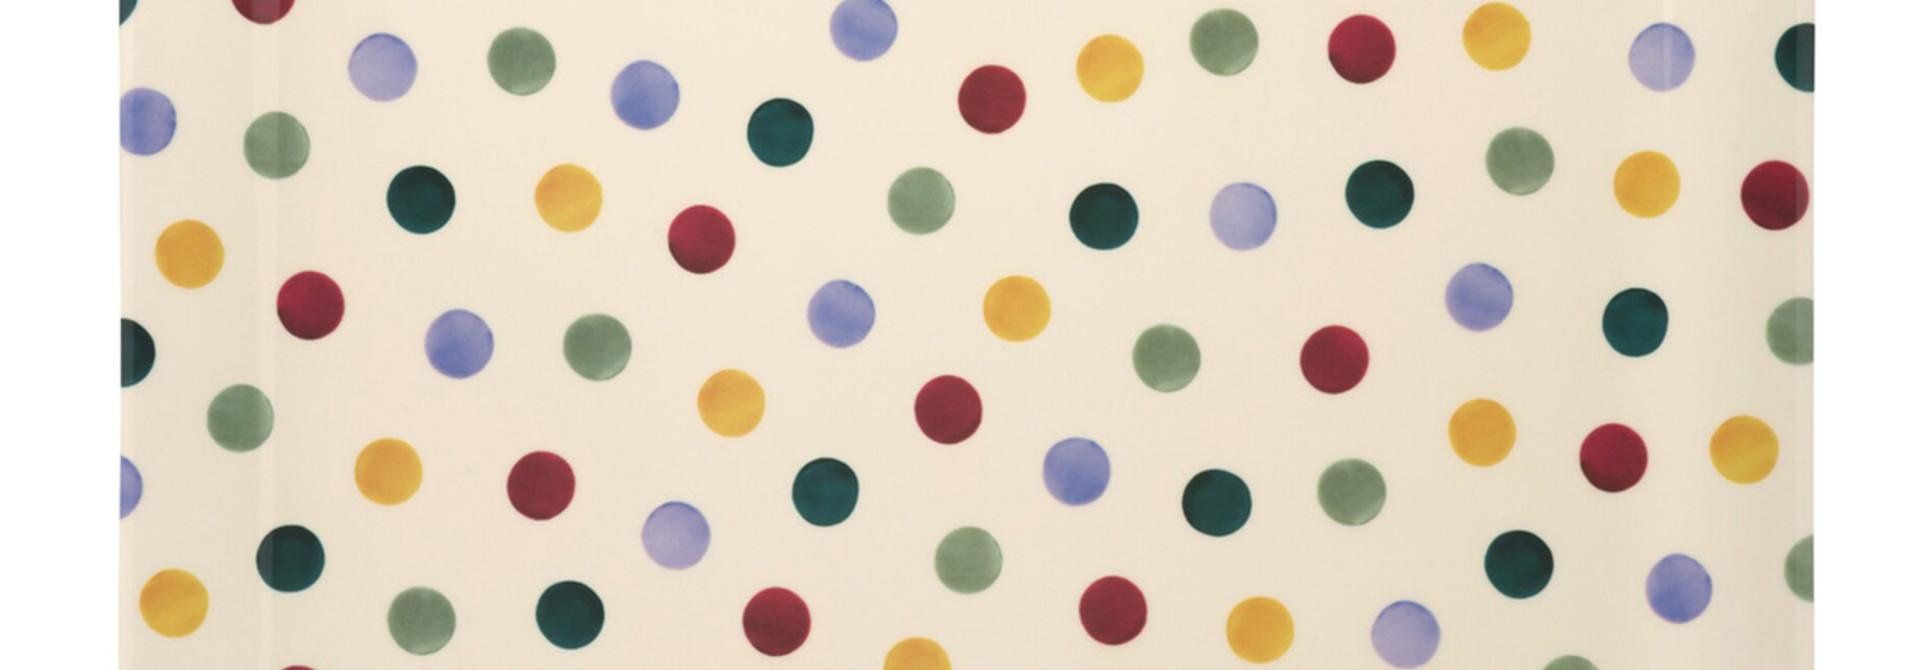 Tray Lg - Polka Dot